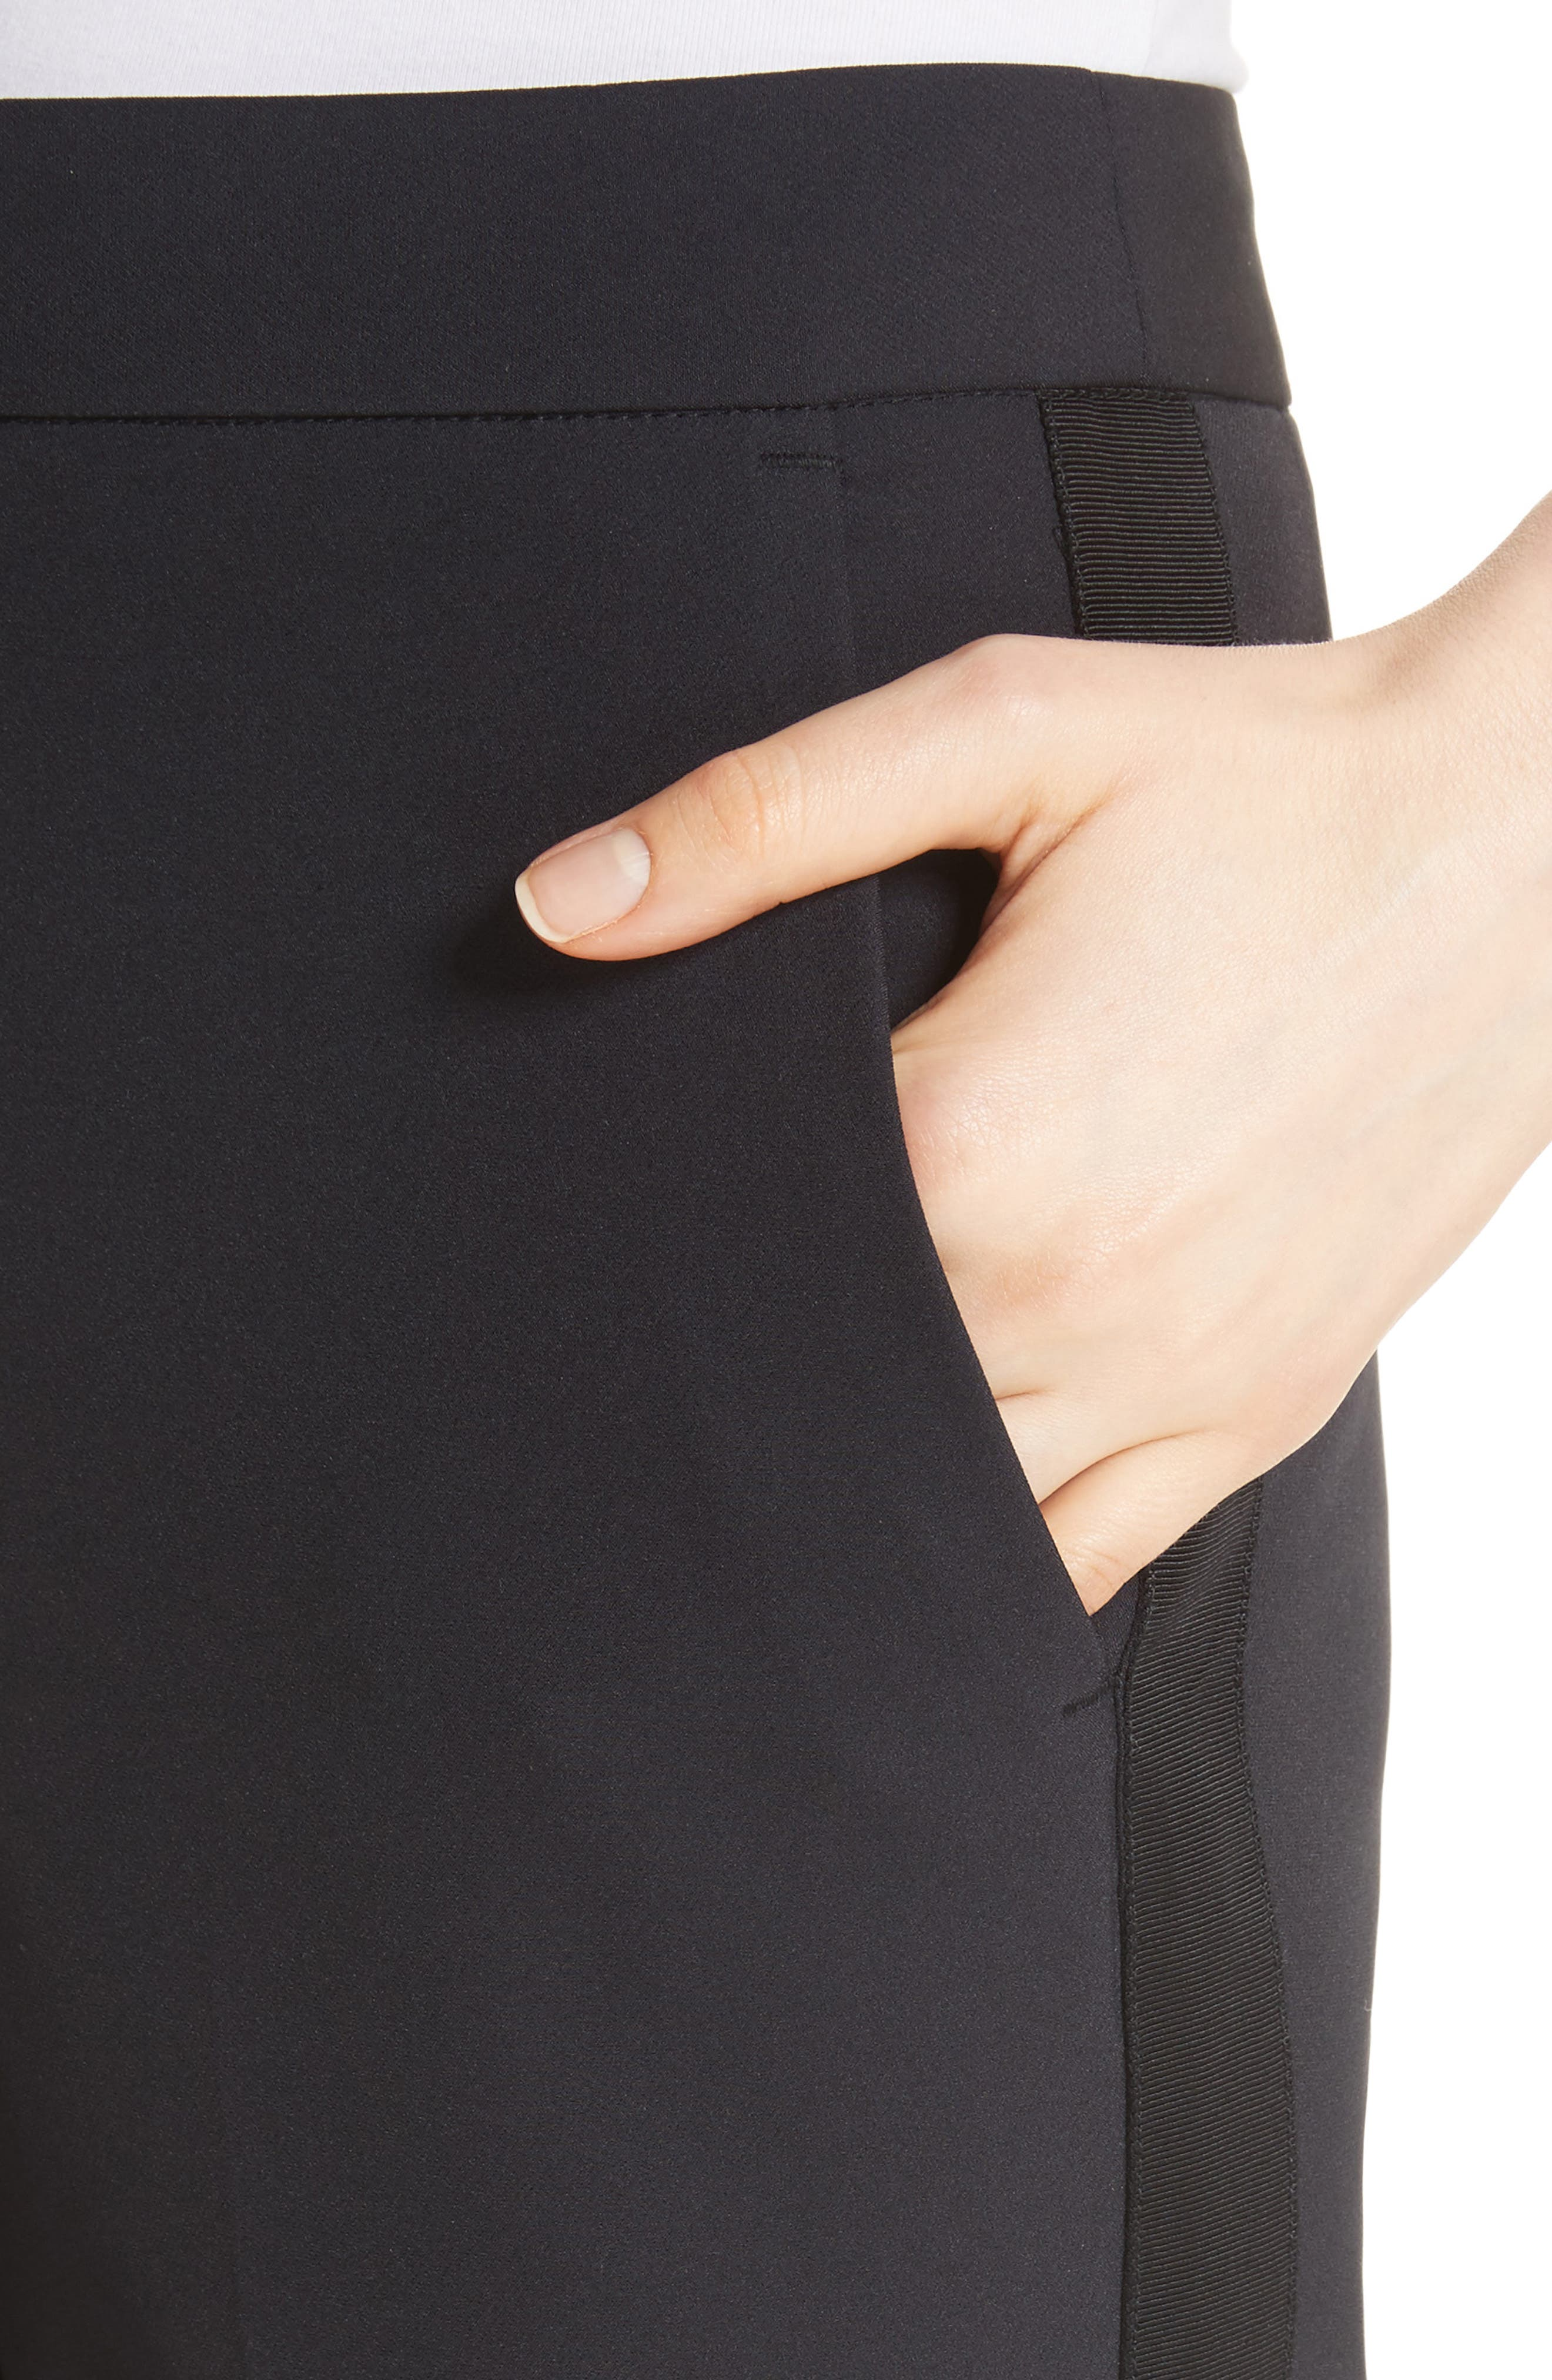 REBECCA TAYLOR, Audra Crop Pants, Alternate thumbnail 5, color, BLACK